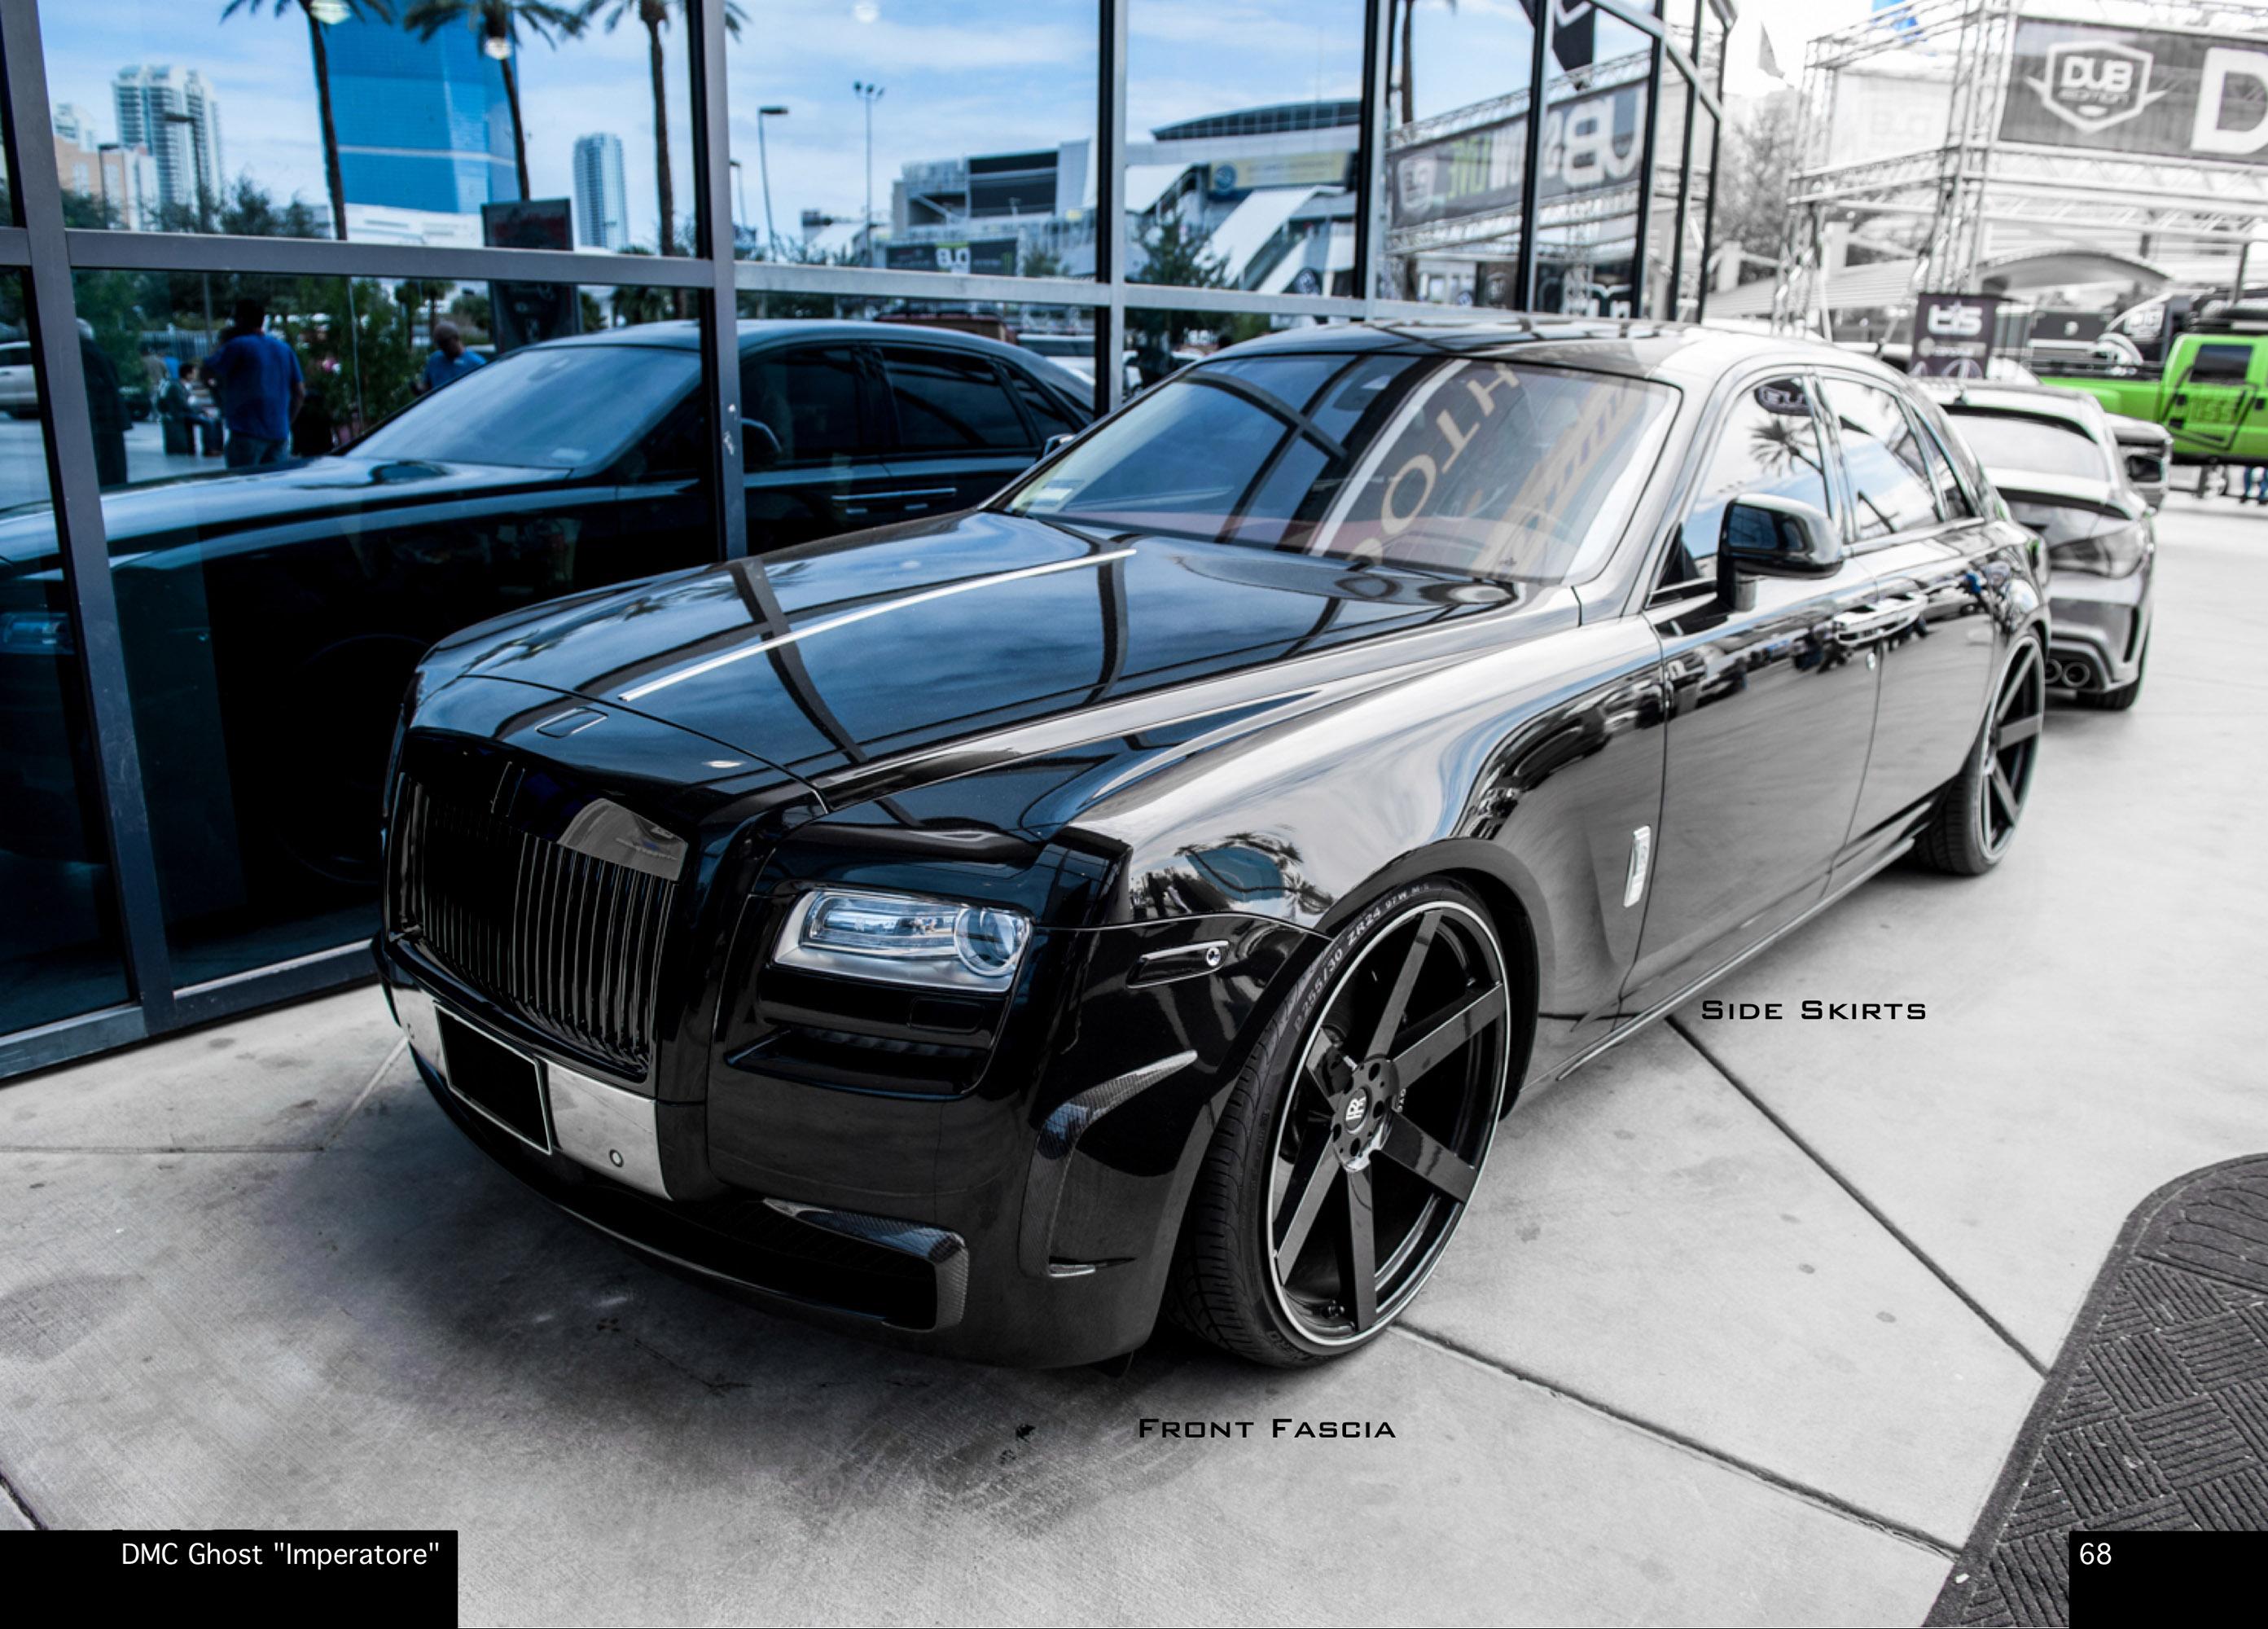 DMC Rolls Royce Ghost IMPERATORE photo #1